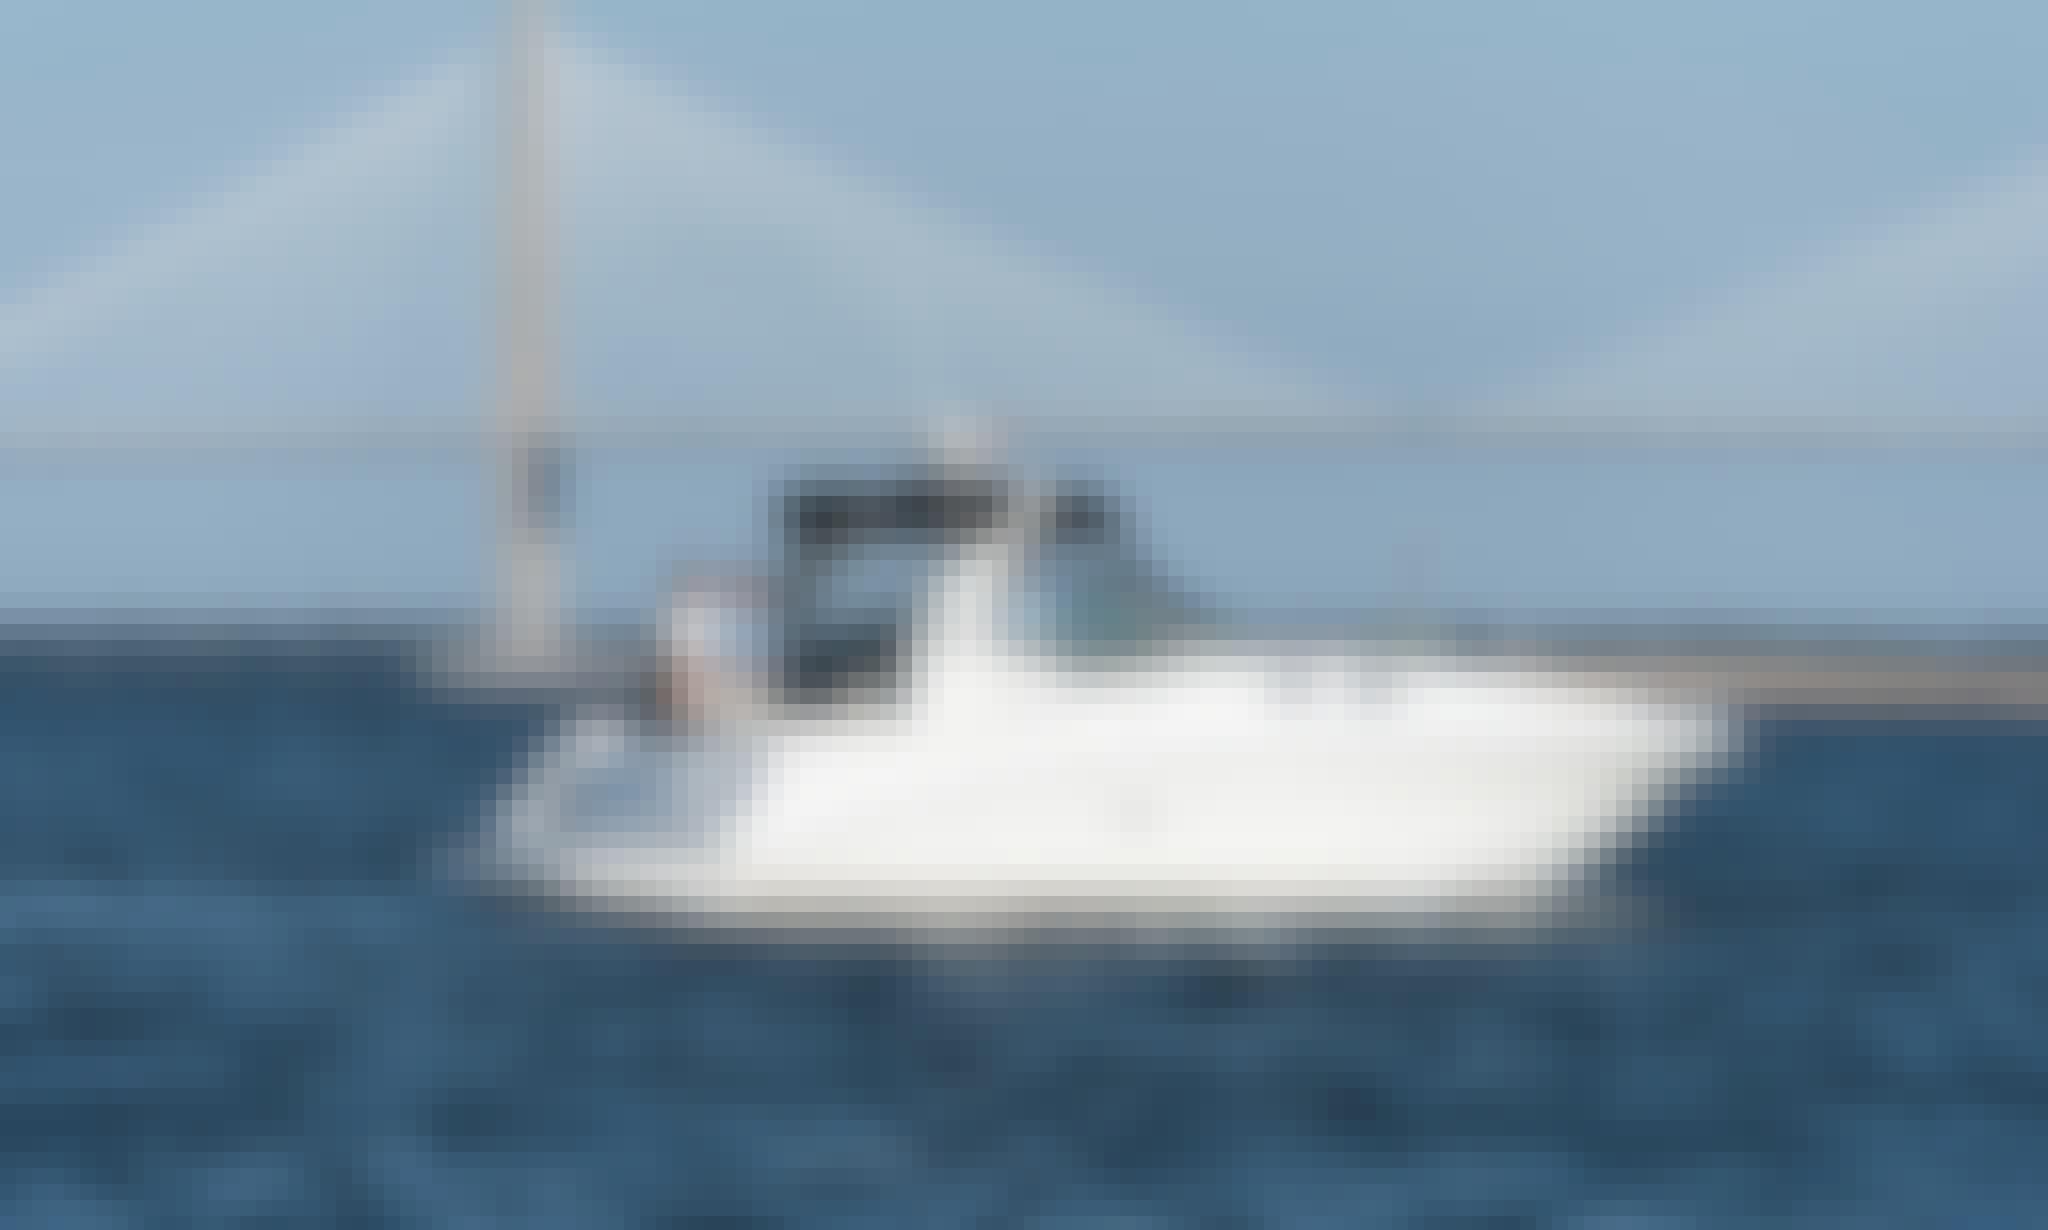 32ft Sea Ray Sundancer Motor Yacht Charter for 6 People in Charleston,SC